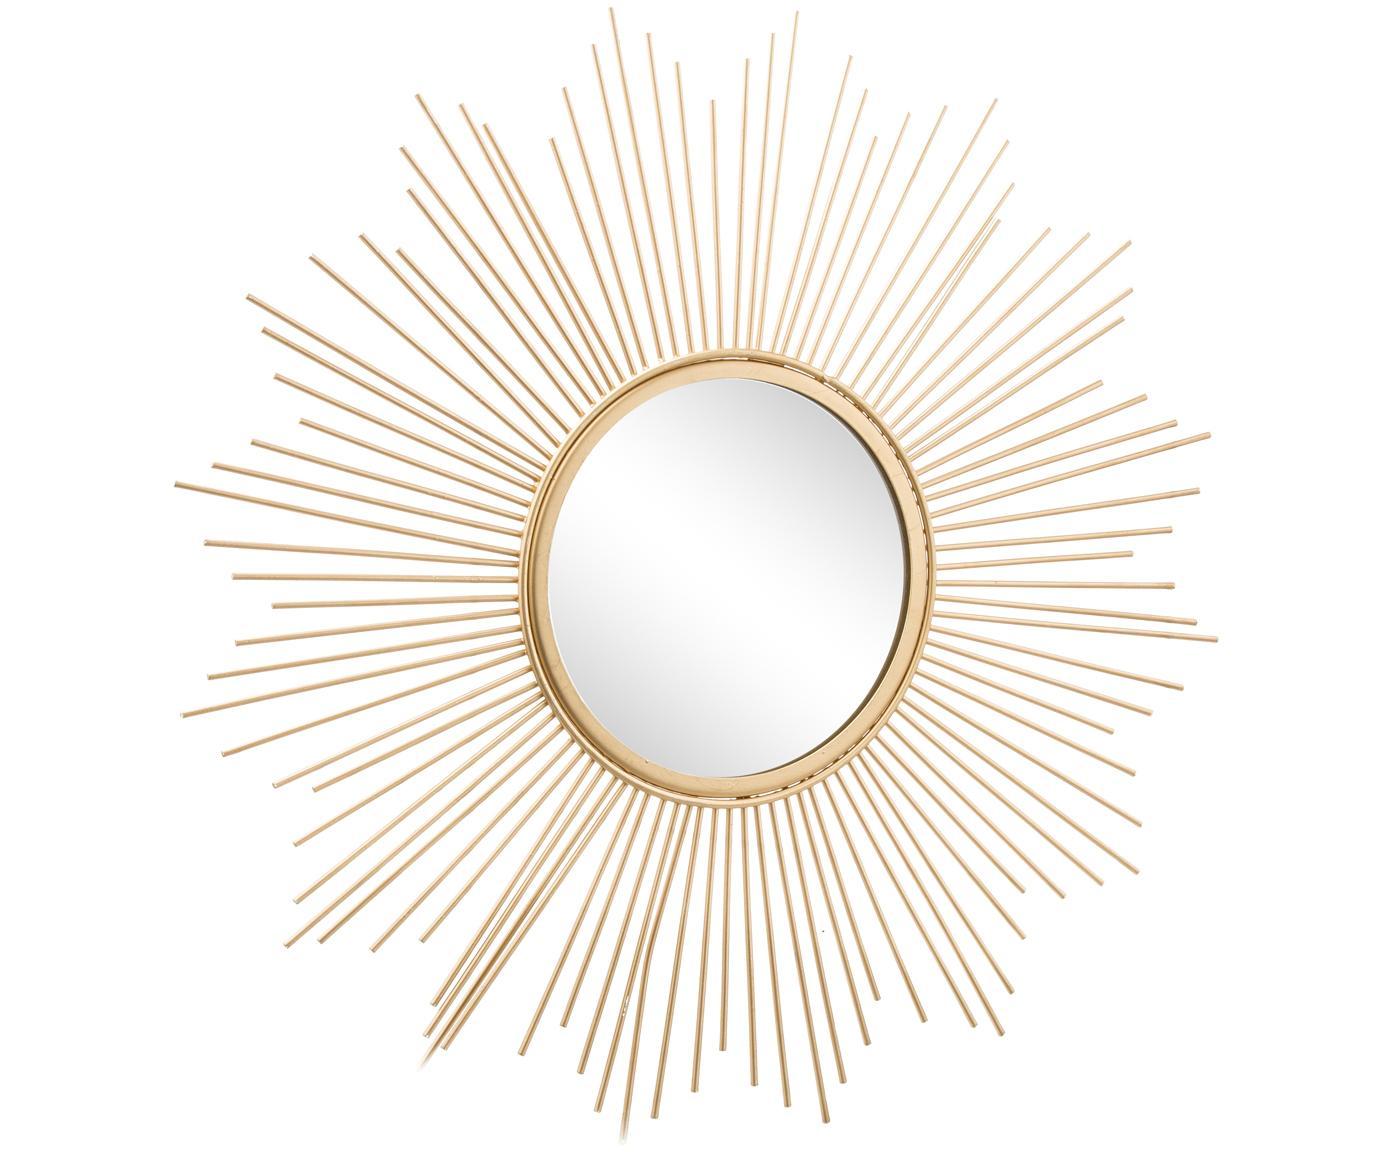 Zonnespiegel Brooklyn in goudkleur, Frame: metaal, Lijst: goudkleurig. Spiegelvlak: spiegelglas, Ø 50 cm